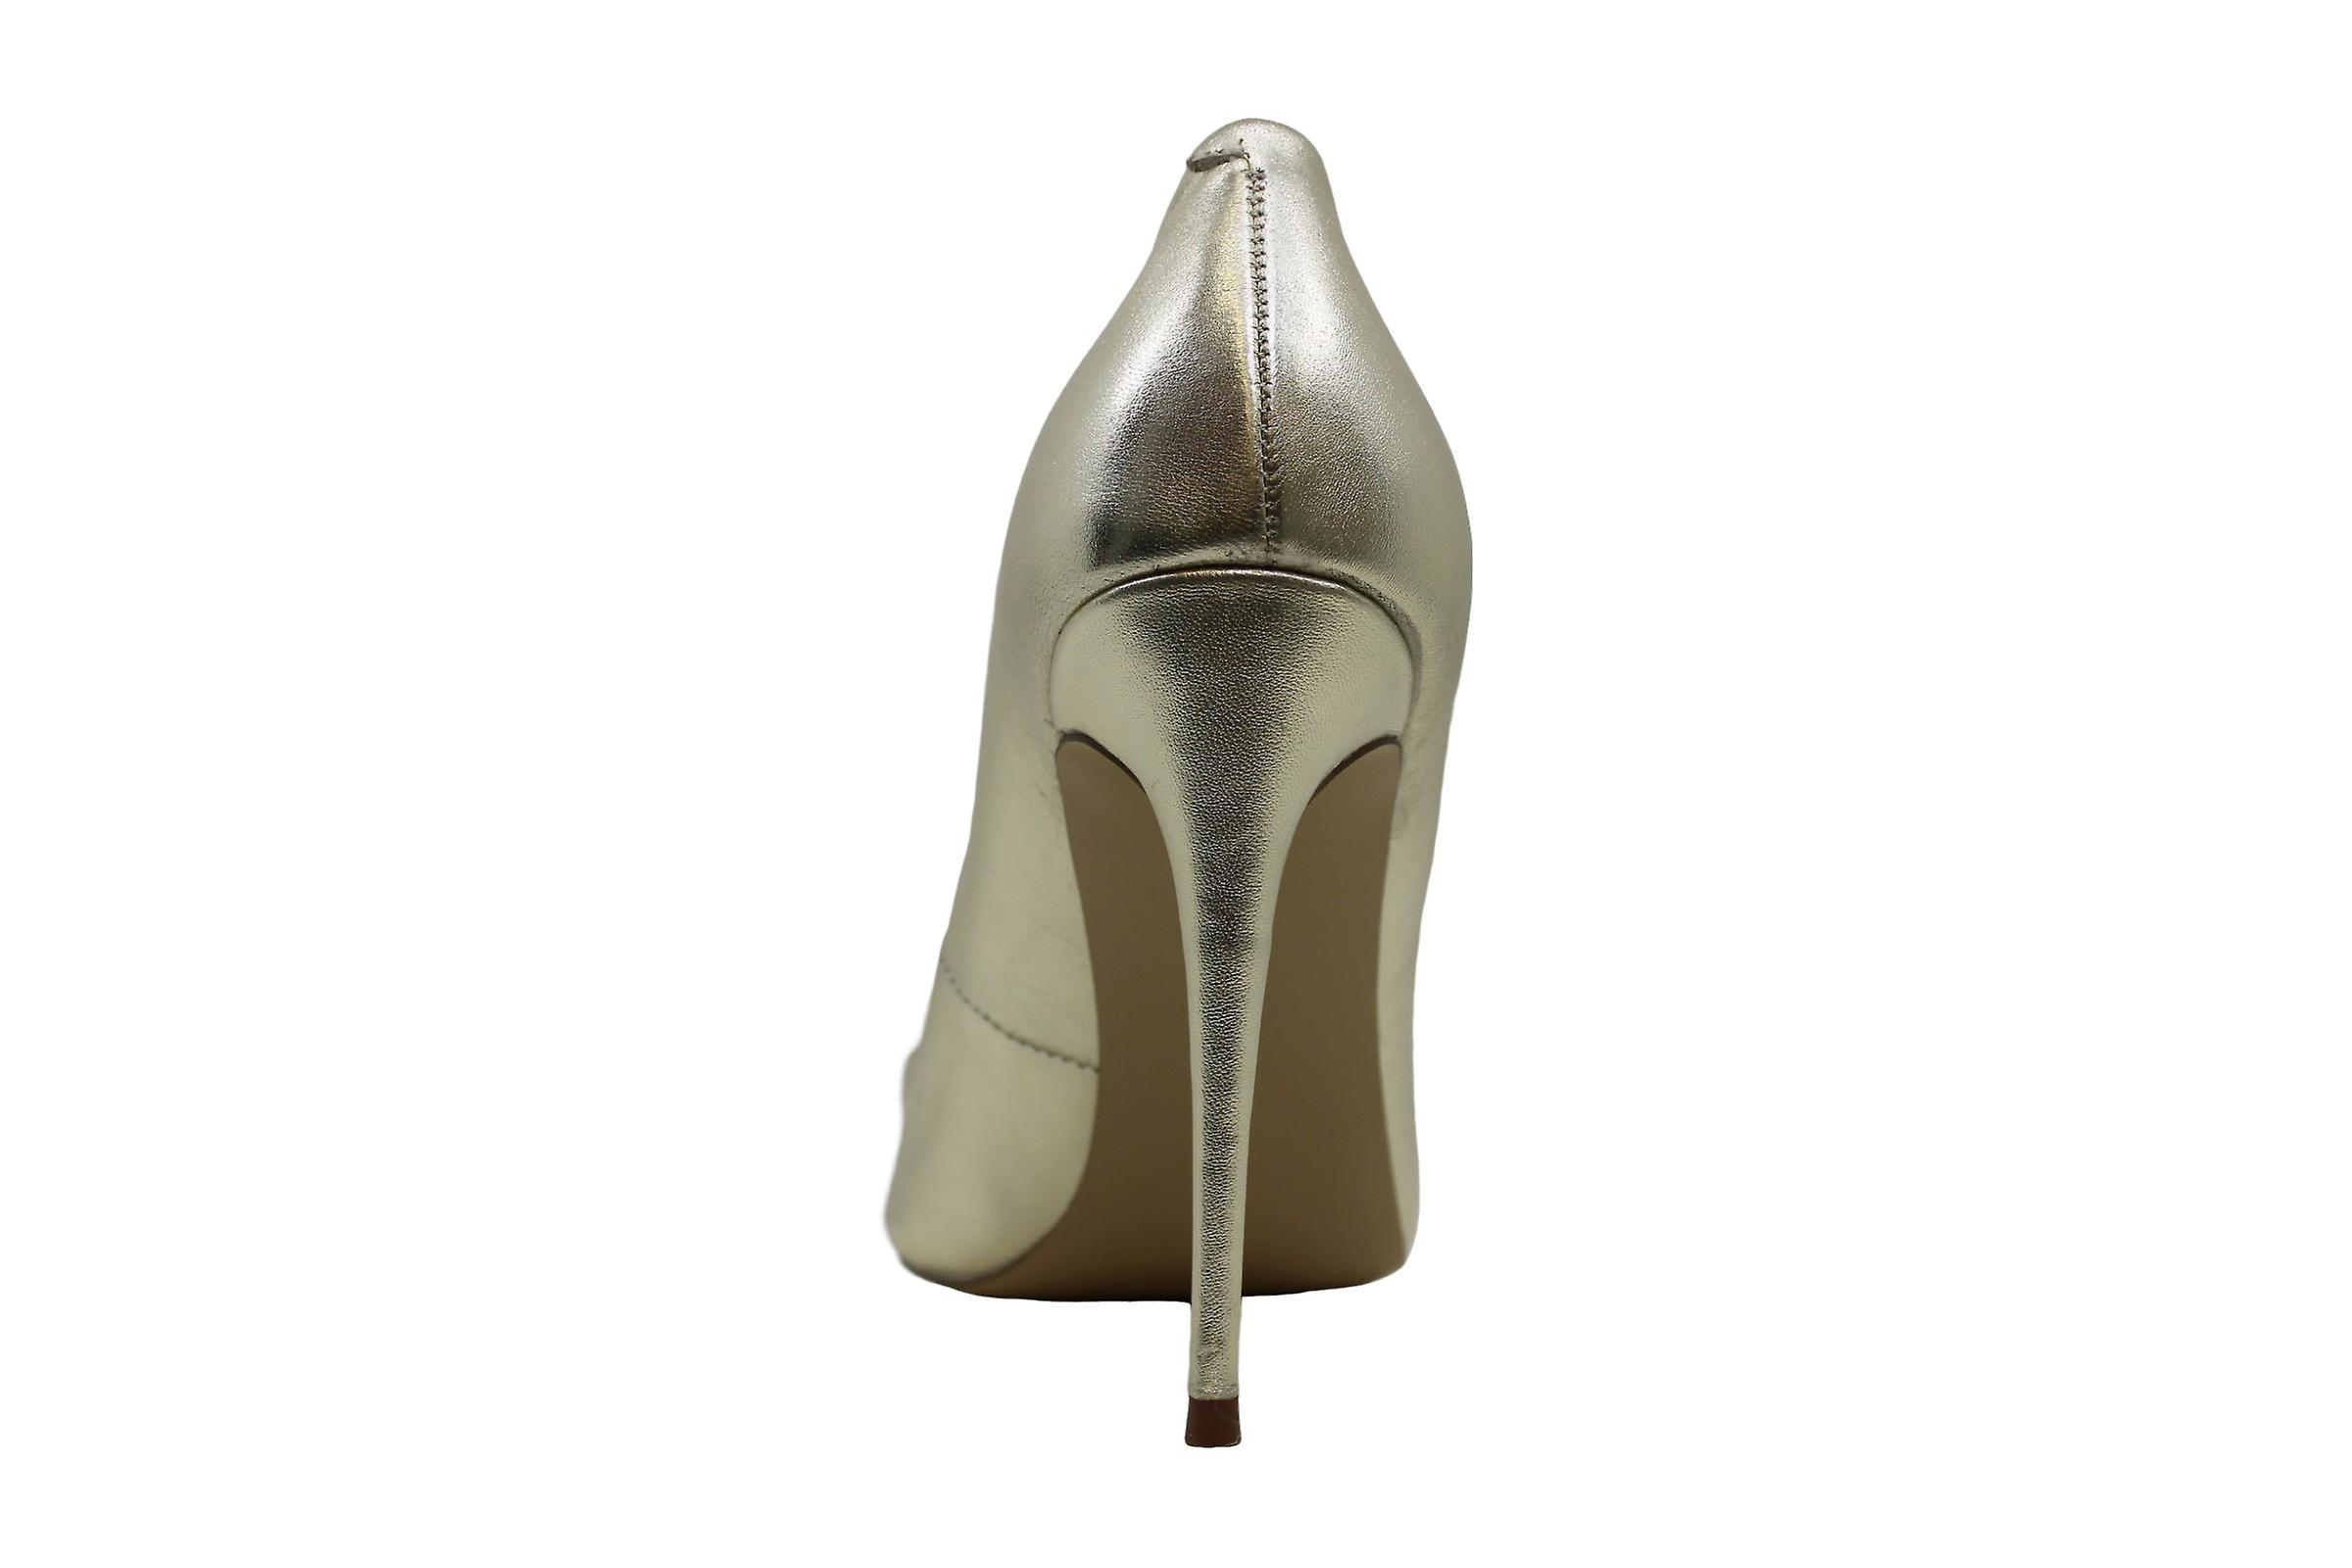 Steve Madden Daisie Pumps Gold Leather Size 8.5M